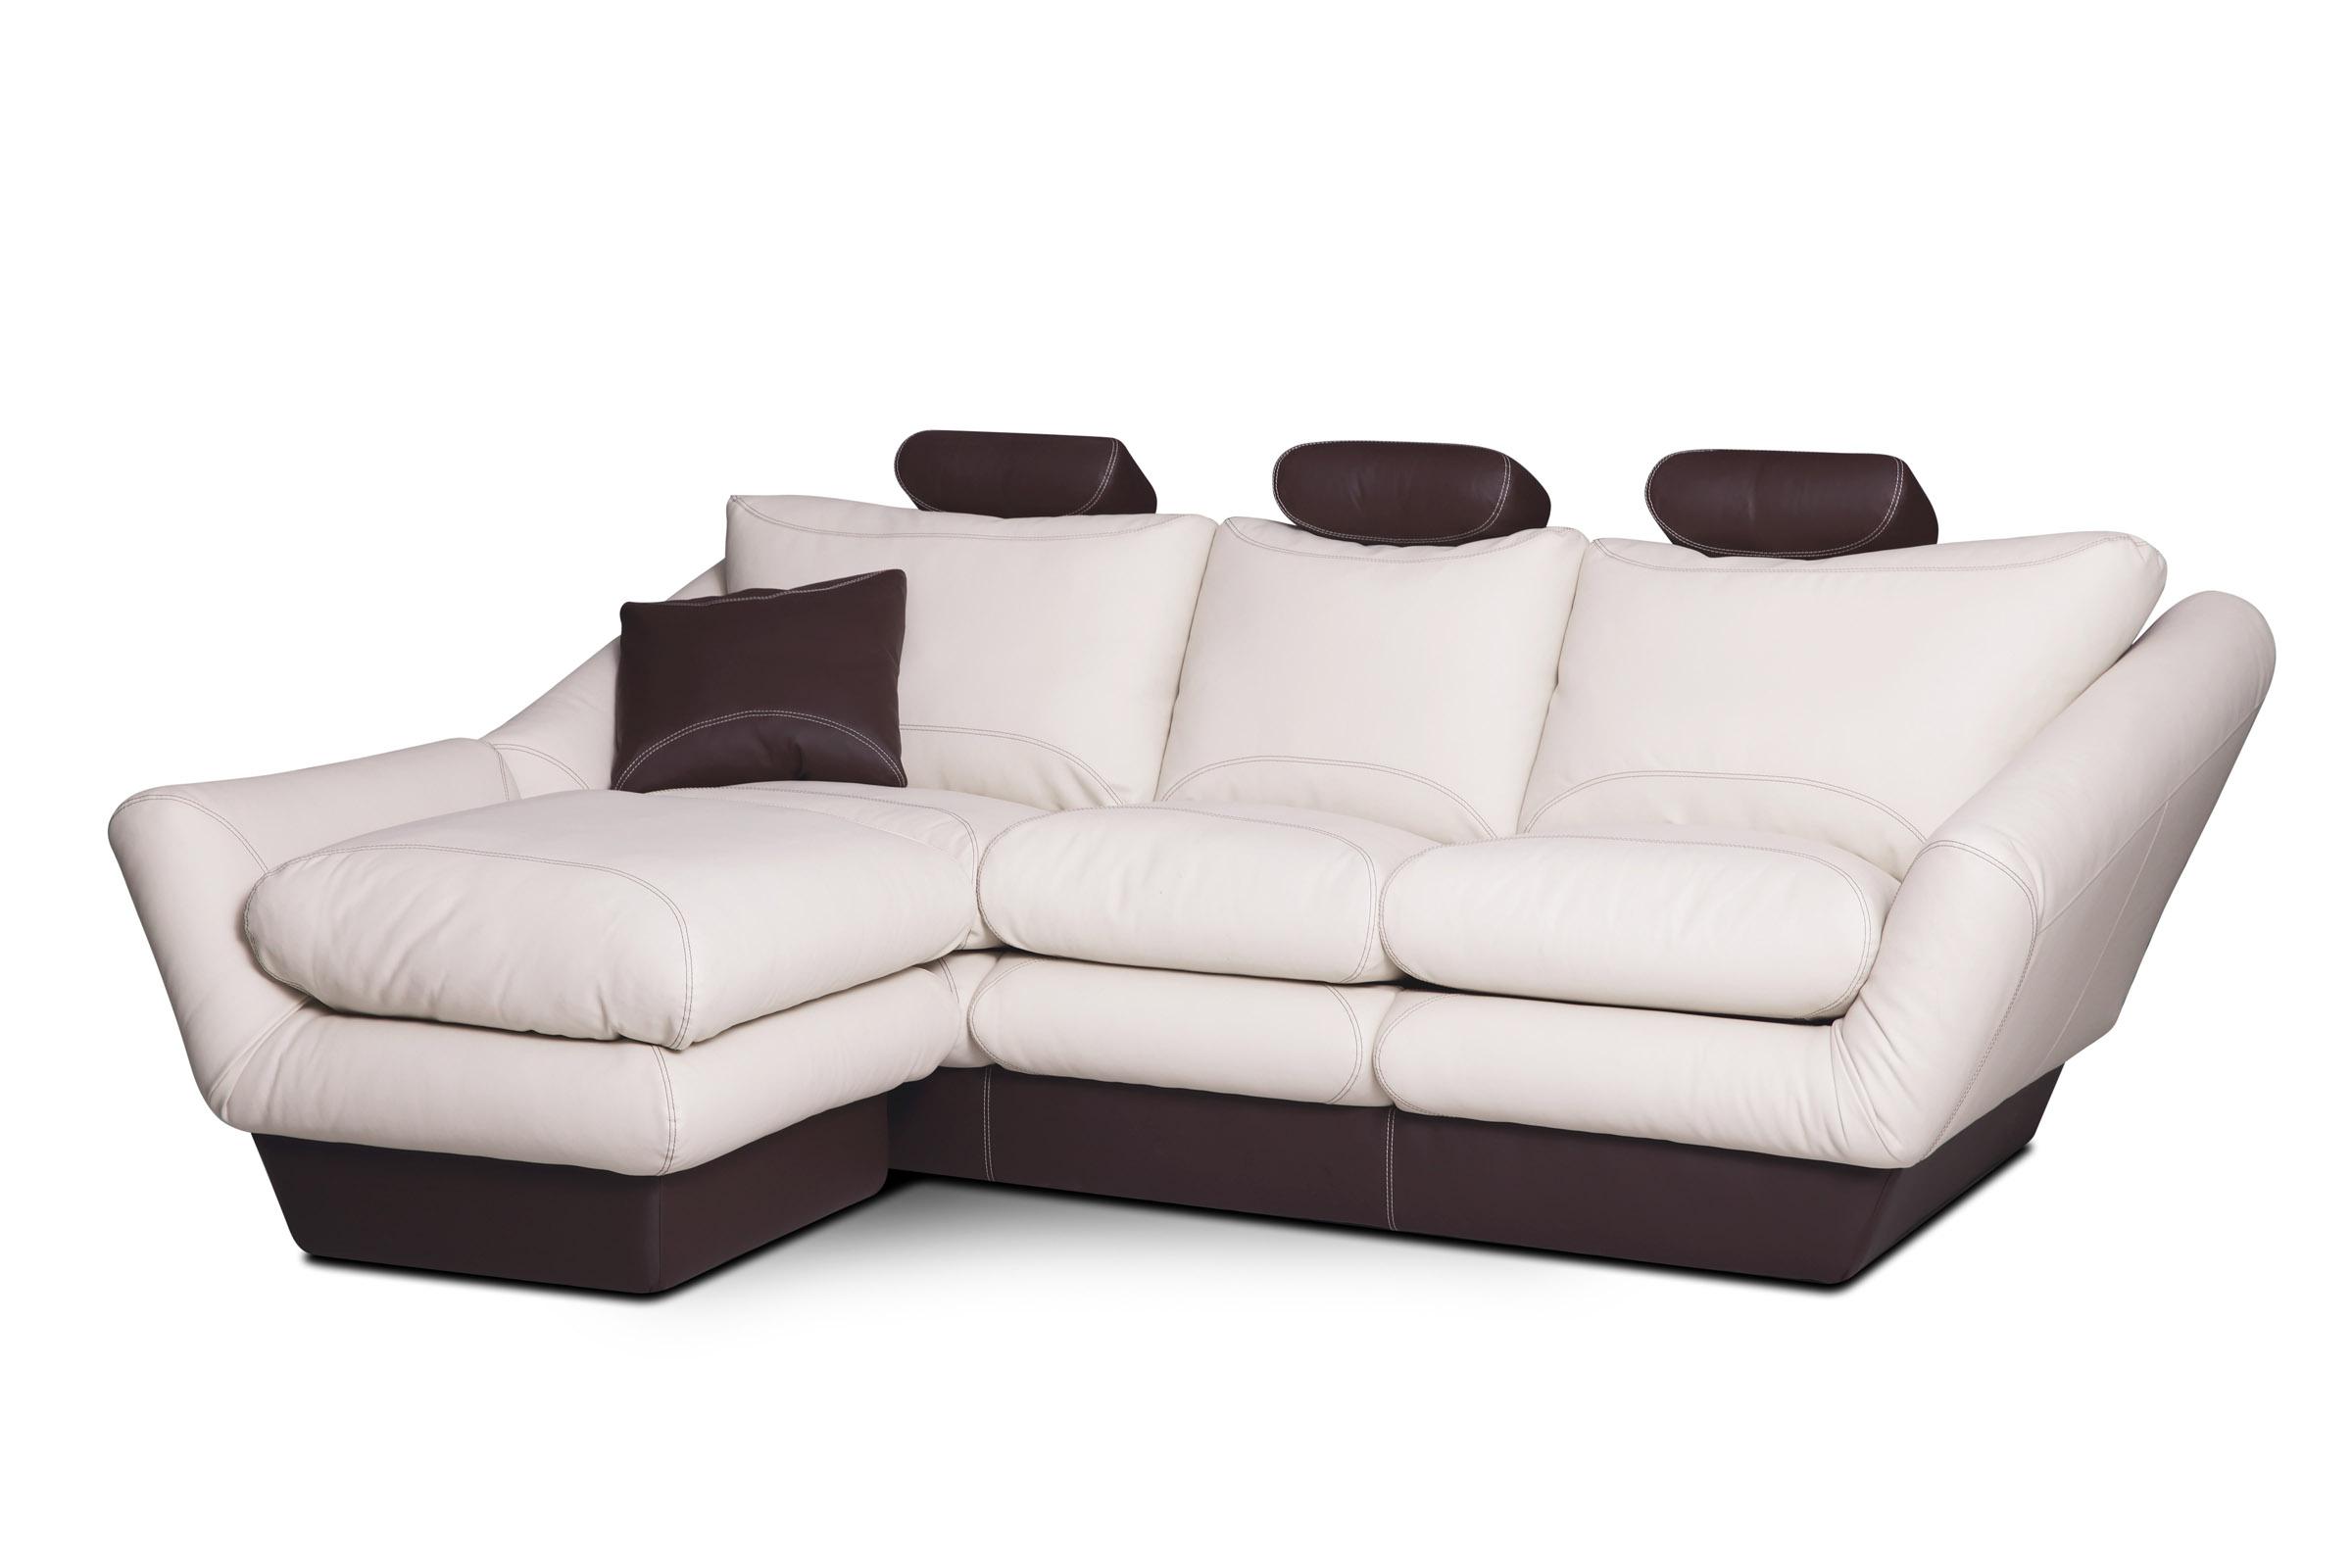 Canapele timisoara la calitate superioara din germania for Canapele extensibile de o persoana